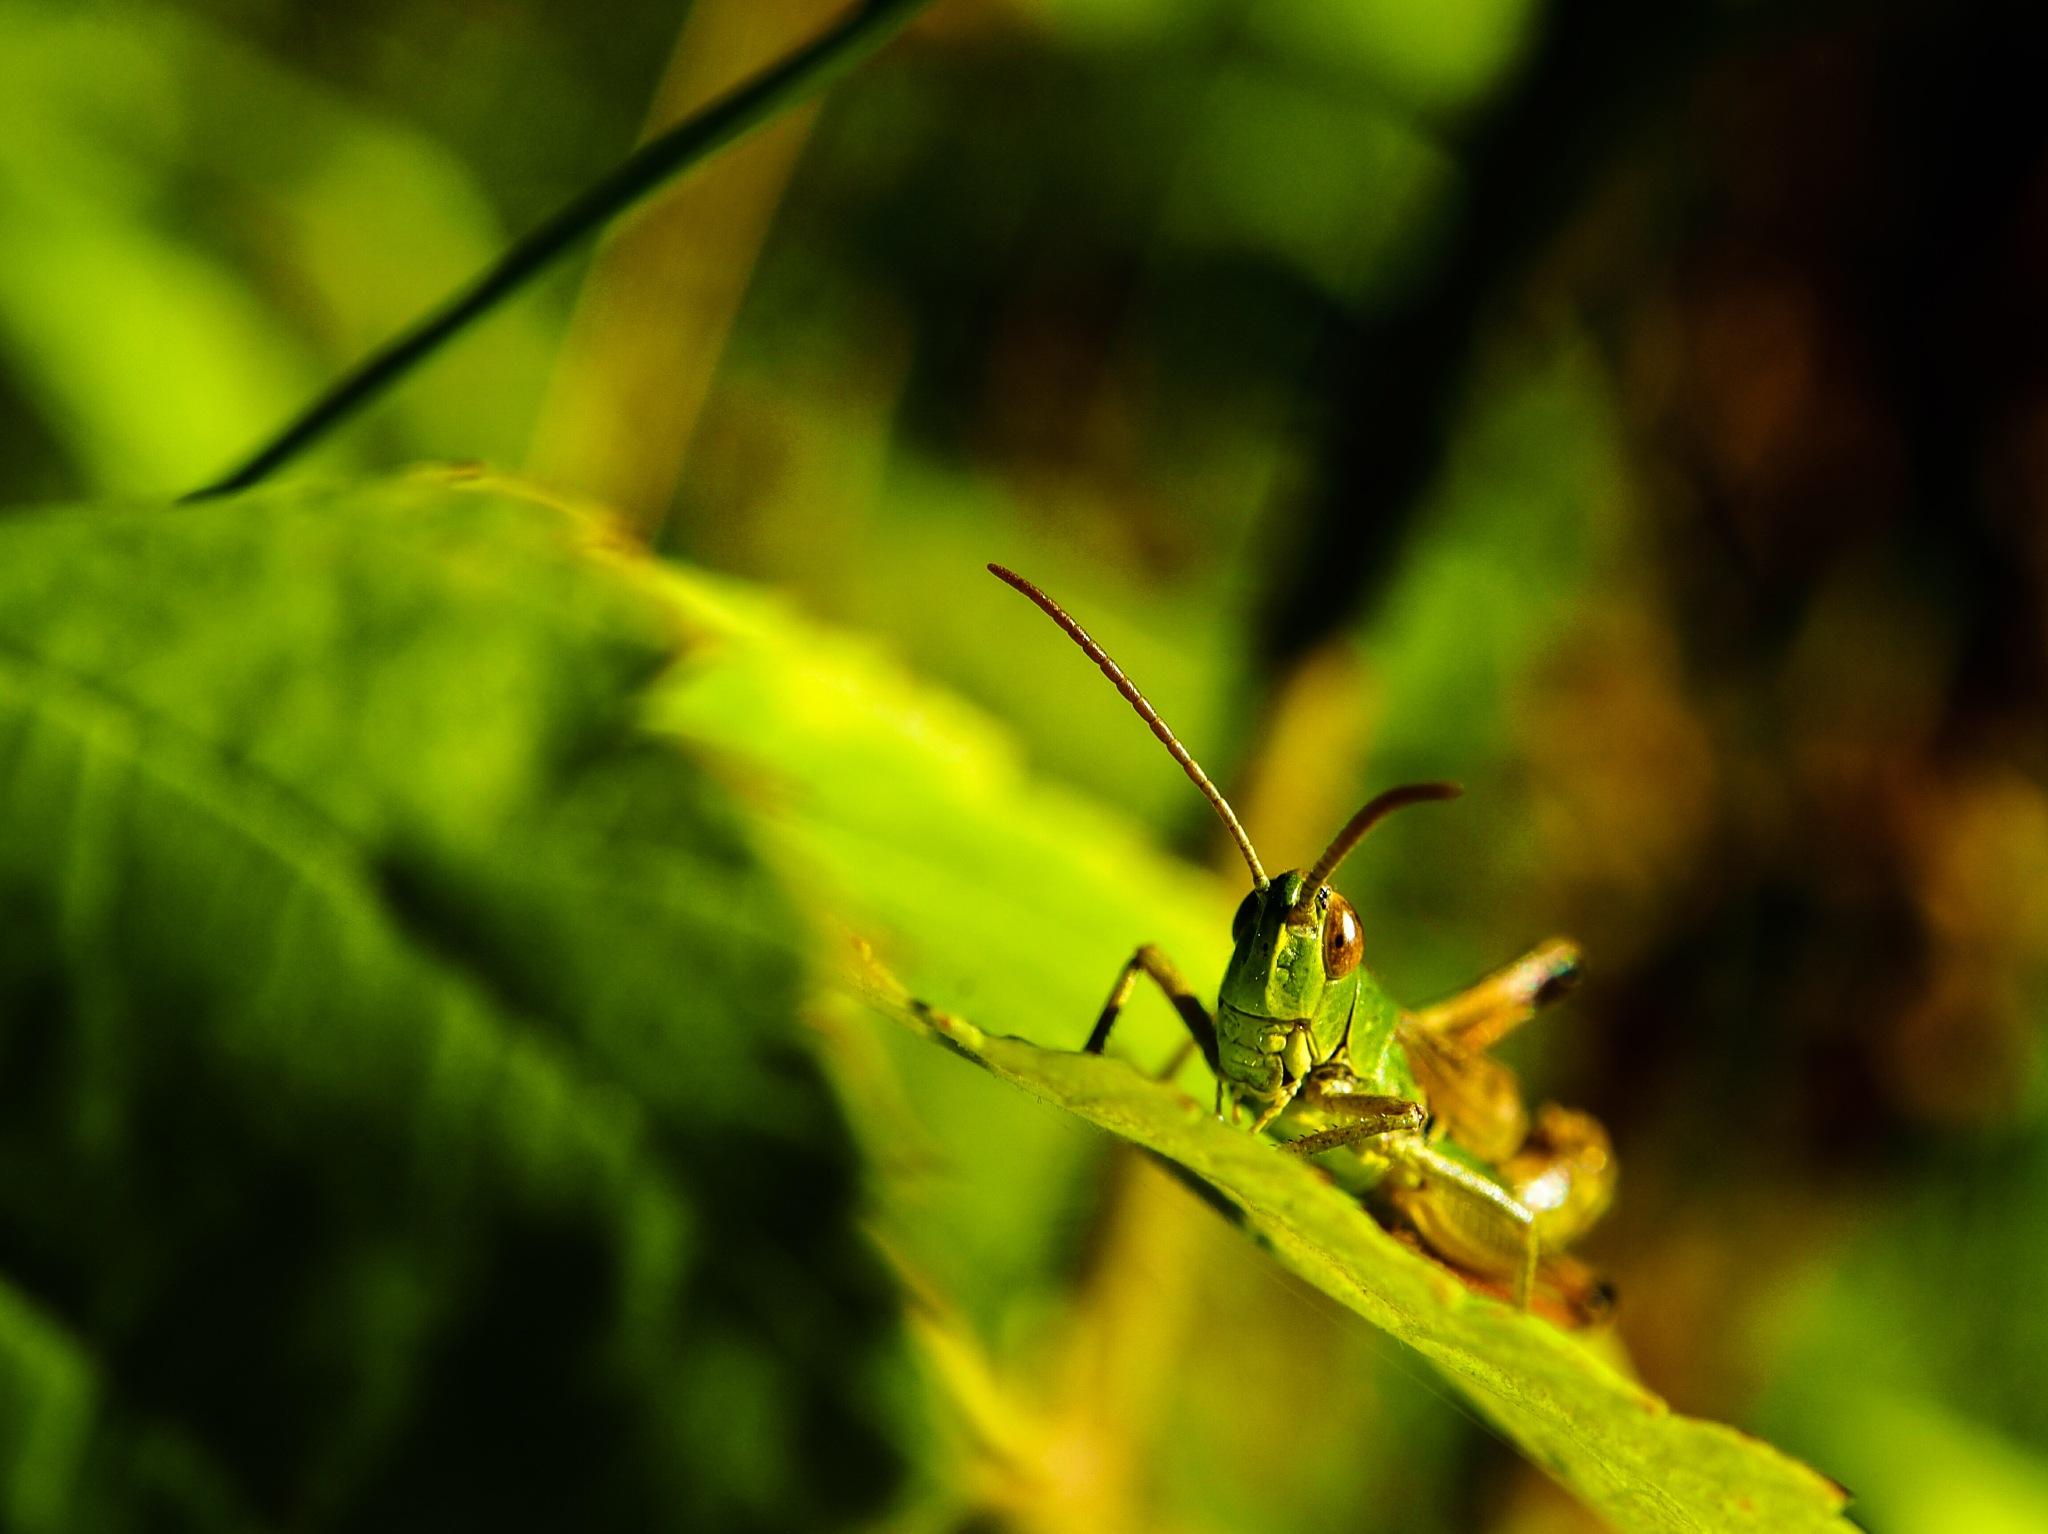 grasshopper by lundmadsen86